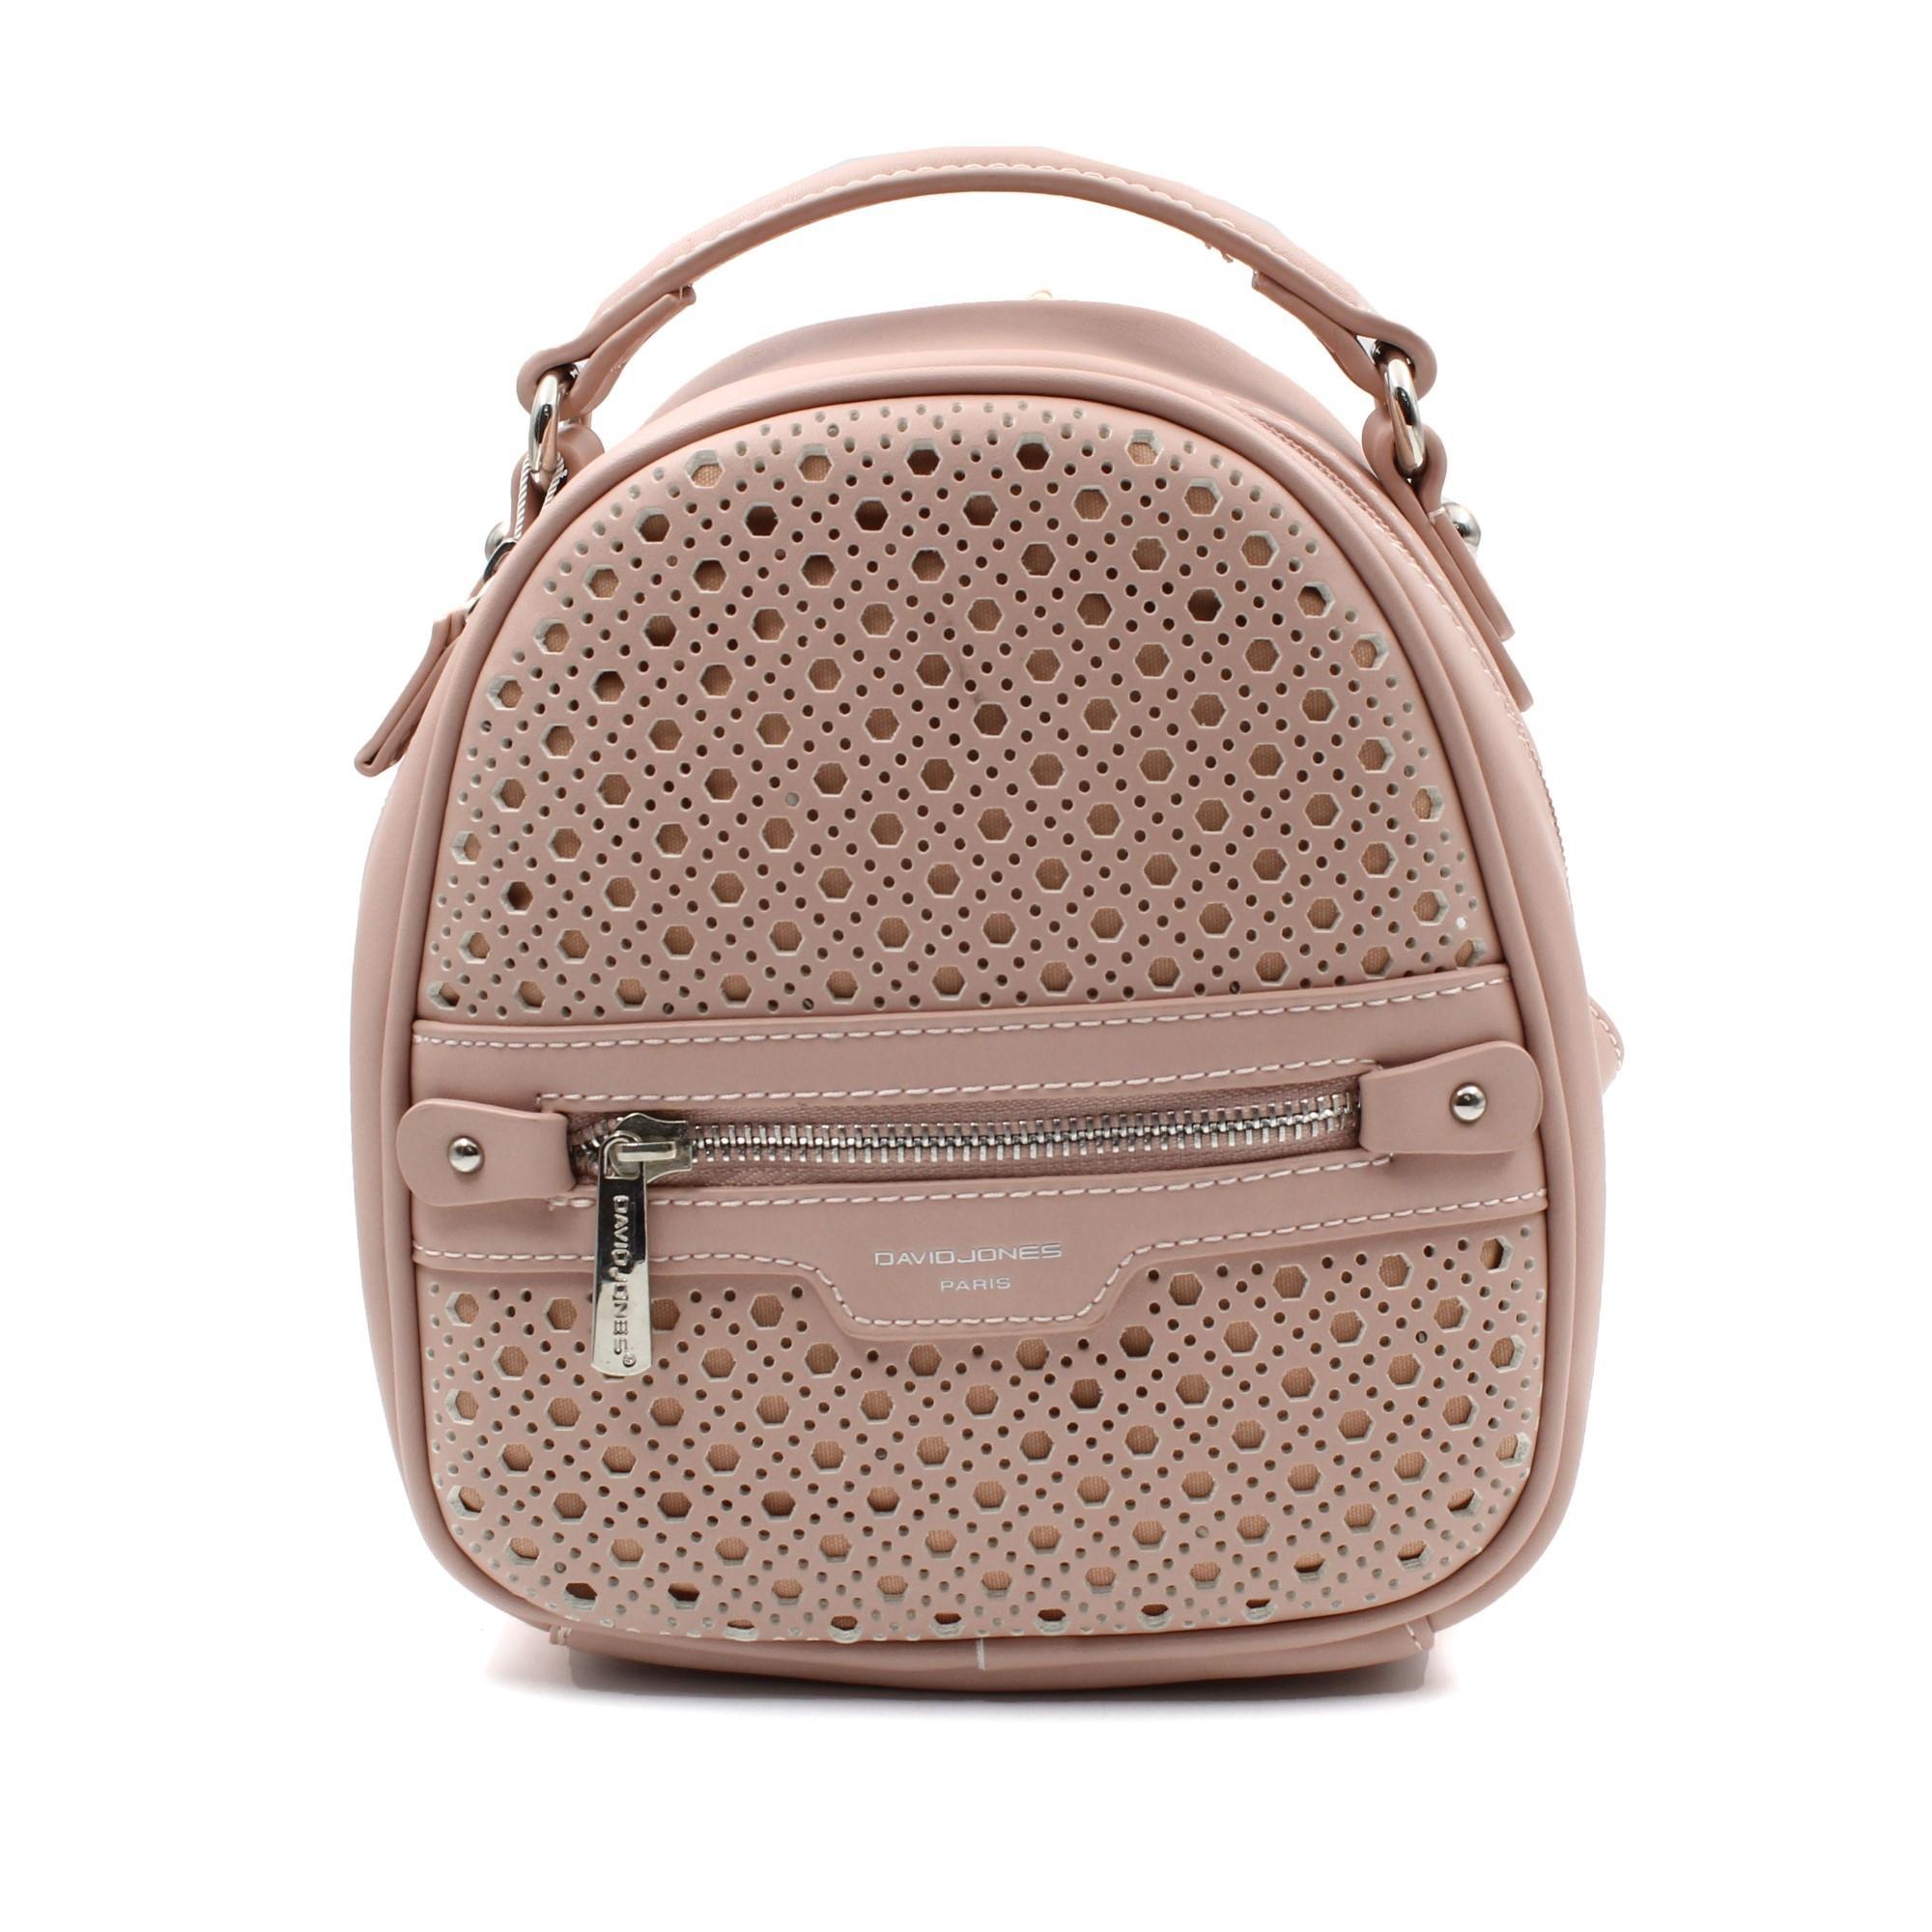 b857b6038808 Buy David Jones Women Bags at Best Prices Online in Nepal - daraz.com.np